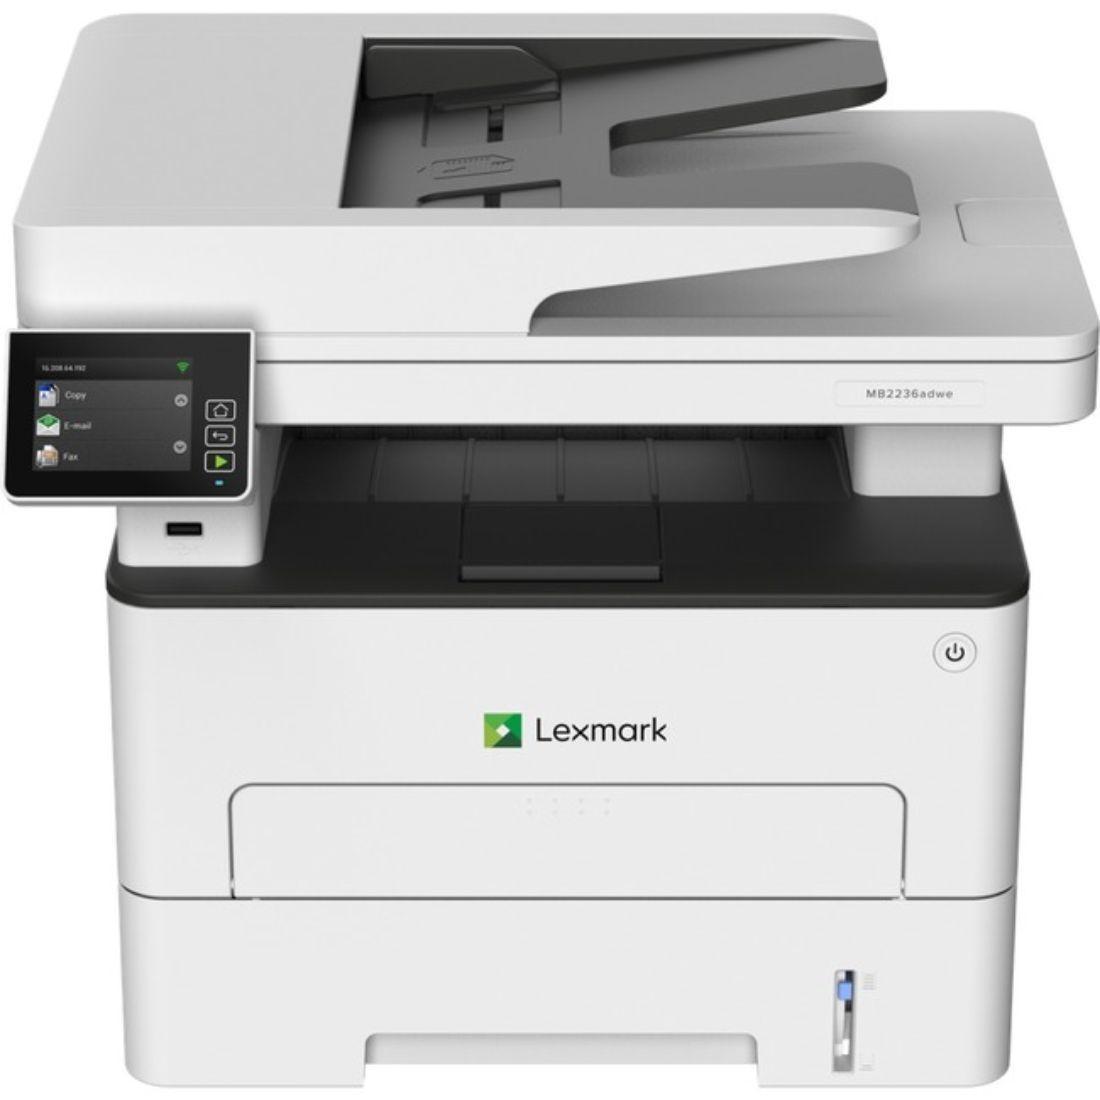 Lexmark MB2236adwe Multifunction Wireless Monochrome Laser P